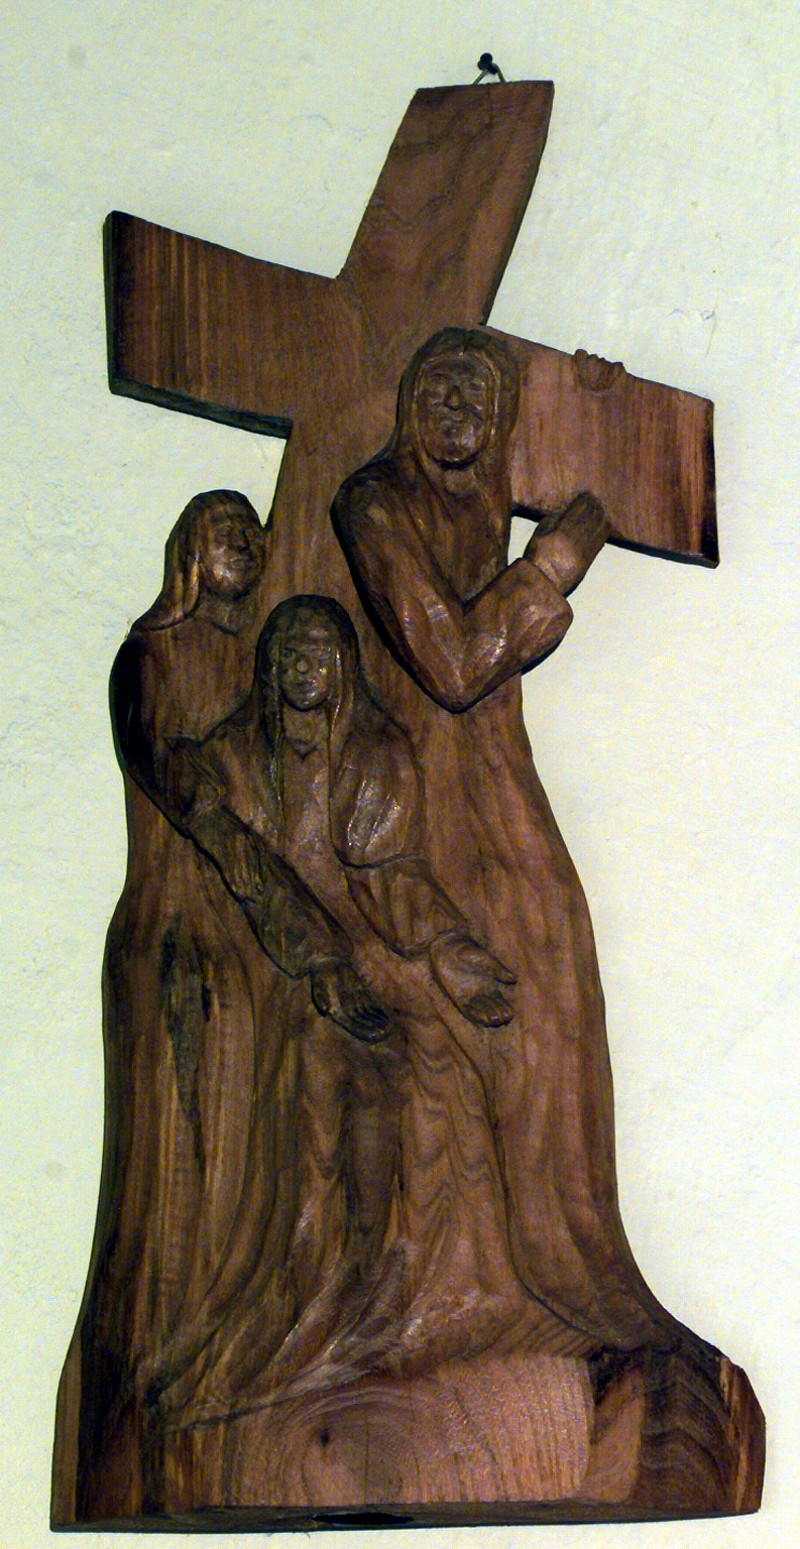 Varischetti G. (1984), Via Crucis stazione VI